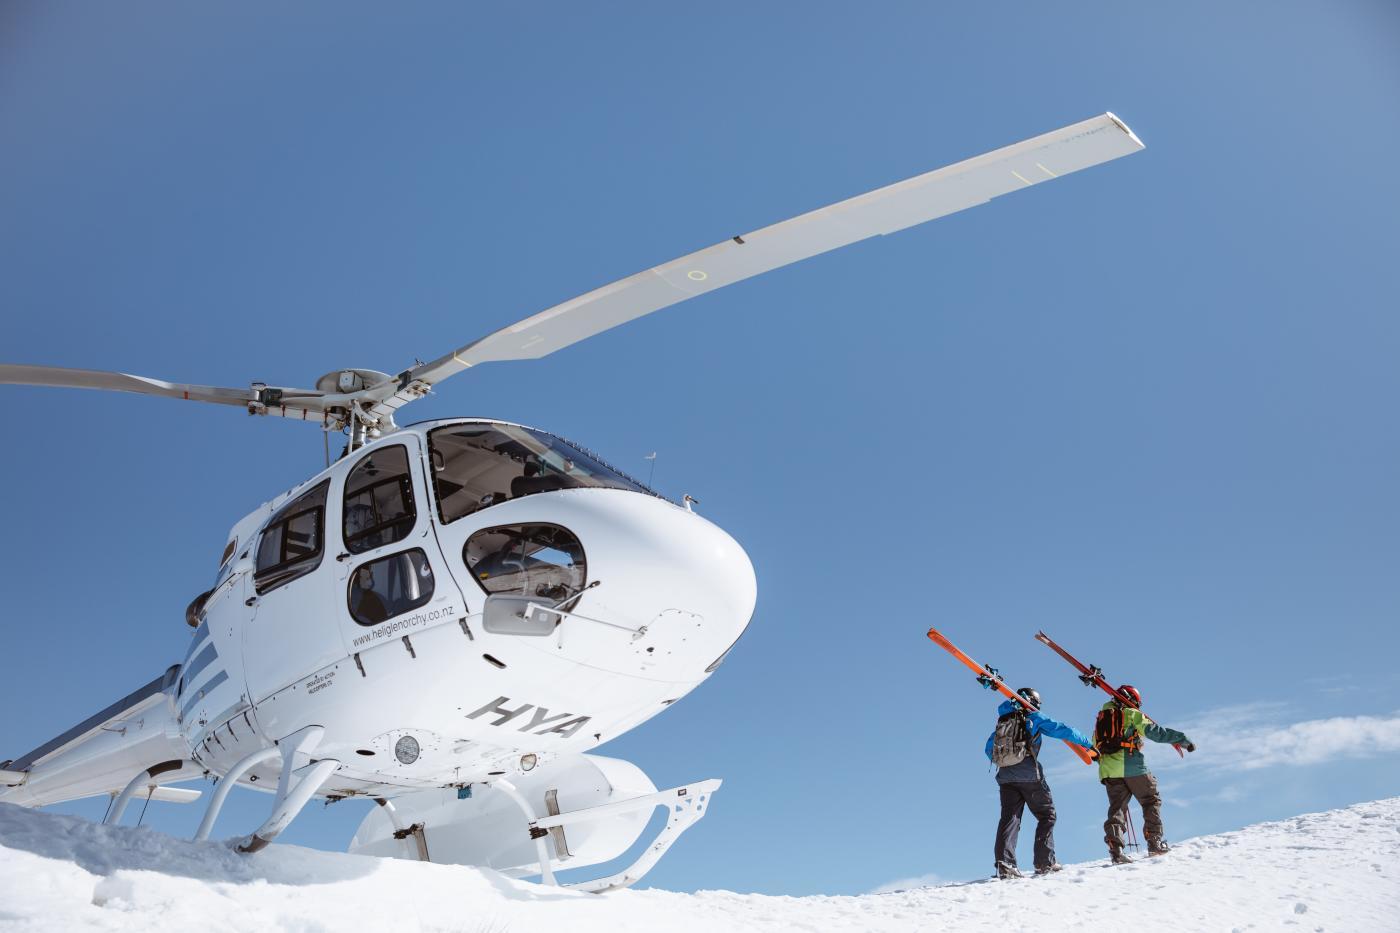 Heli Skiing landing on mountain with skiers